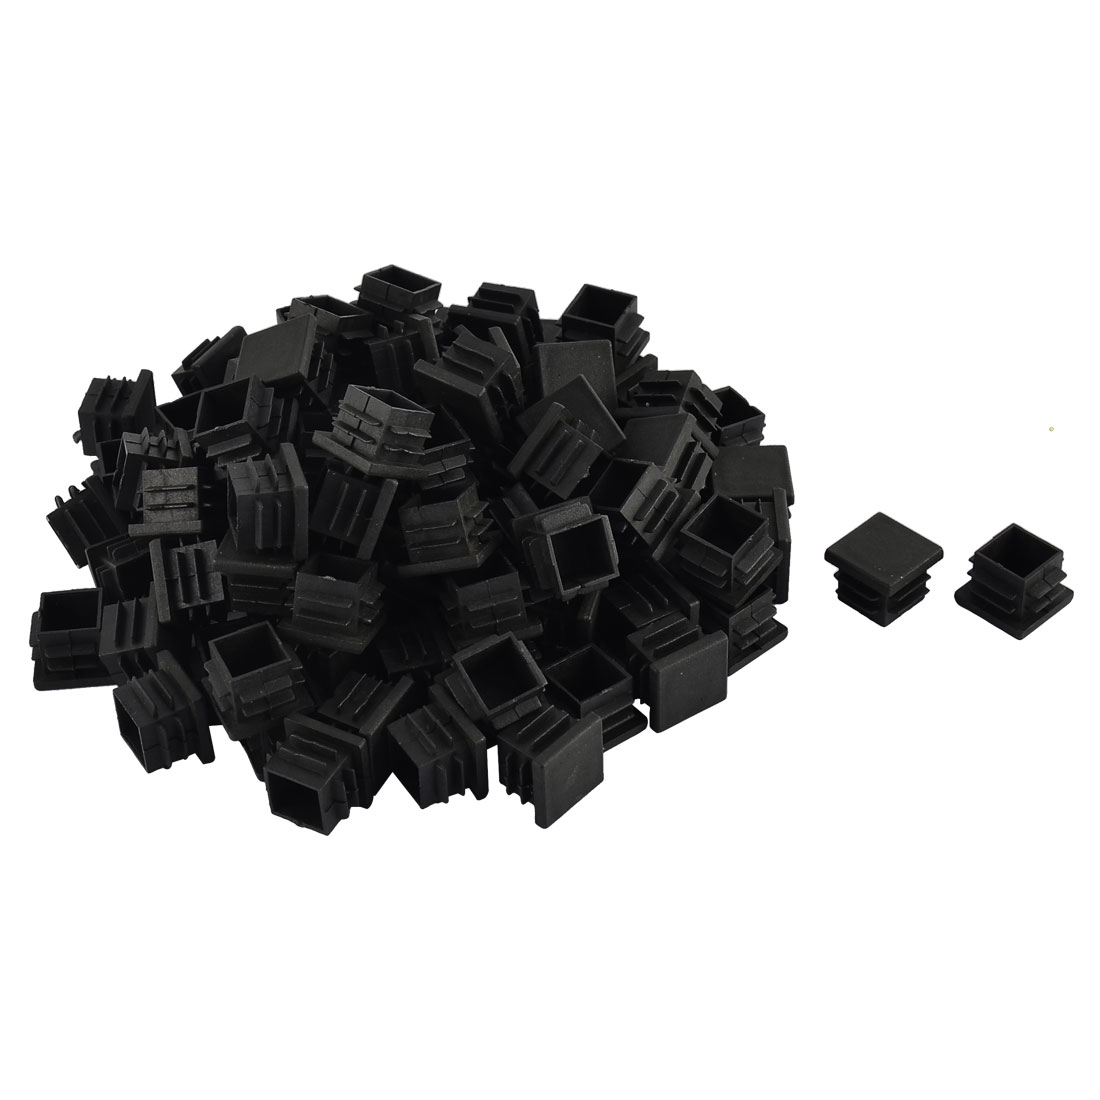 Furniture Table Chair Legs Plastic Square Tube Pipe Insert Cap Cover Black 19 x 19mm 100pcs